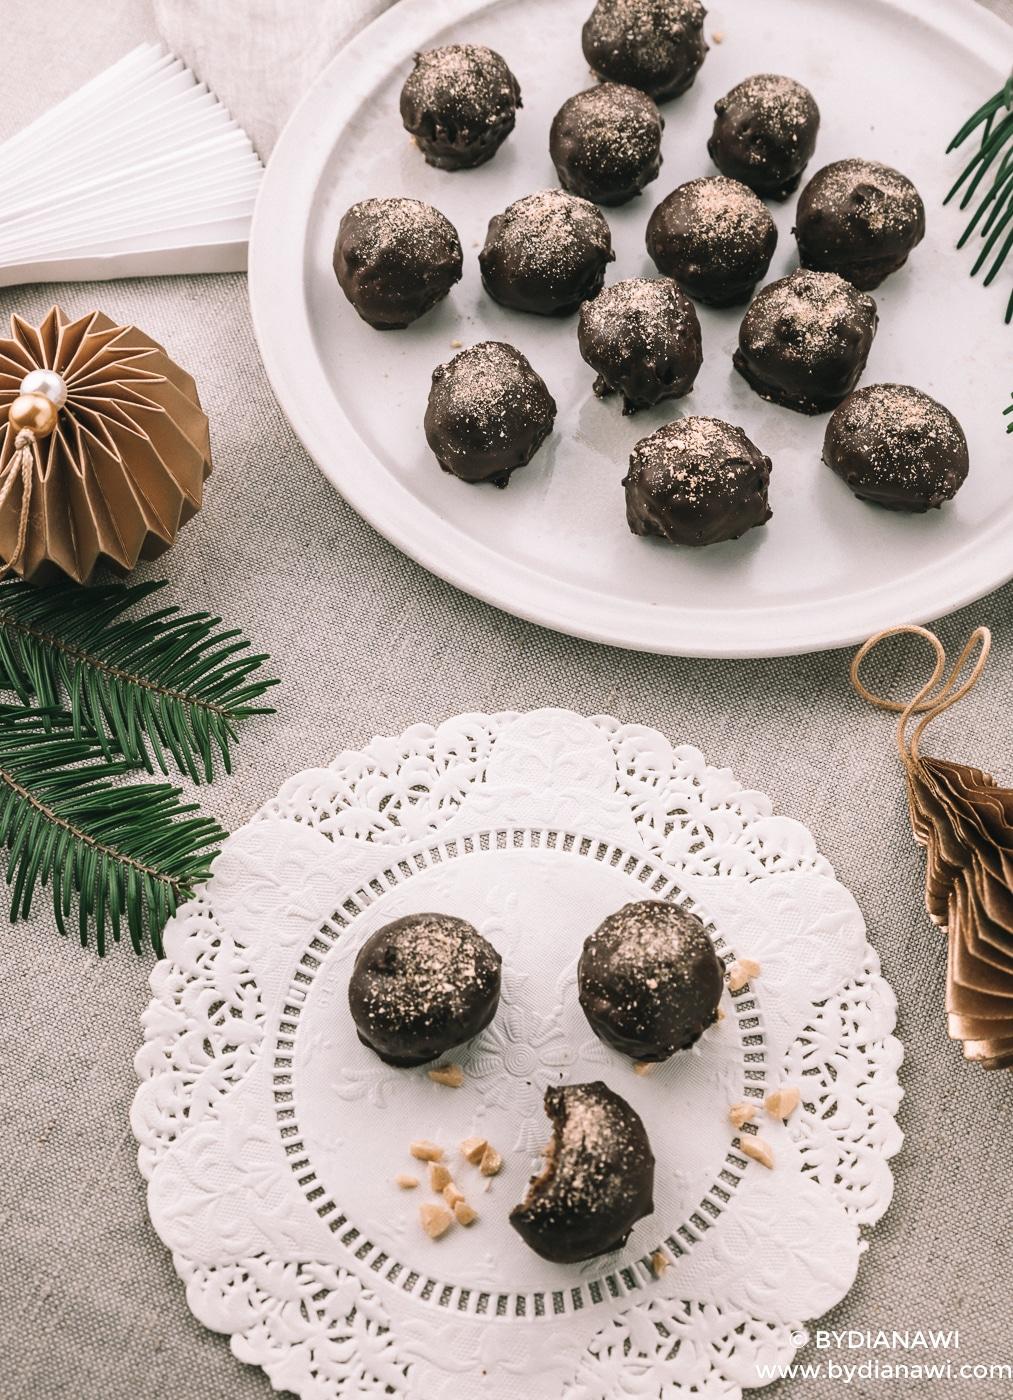 snickers kugler, sund konfekt, julekonfekt, snickers bites